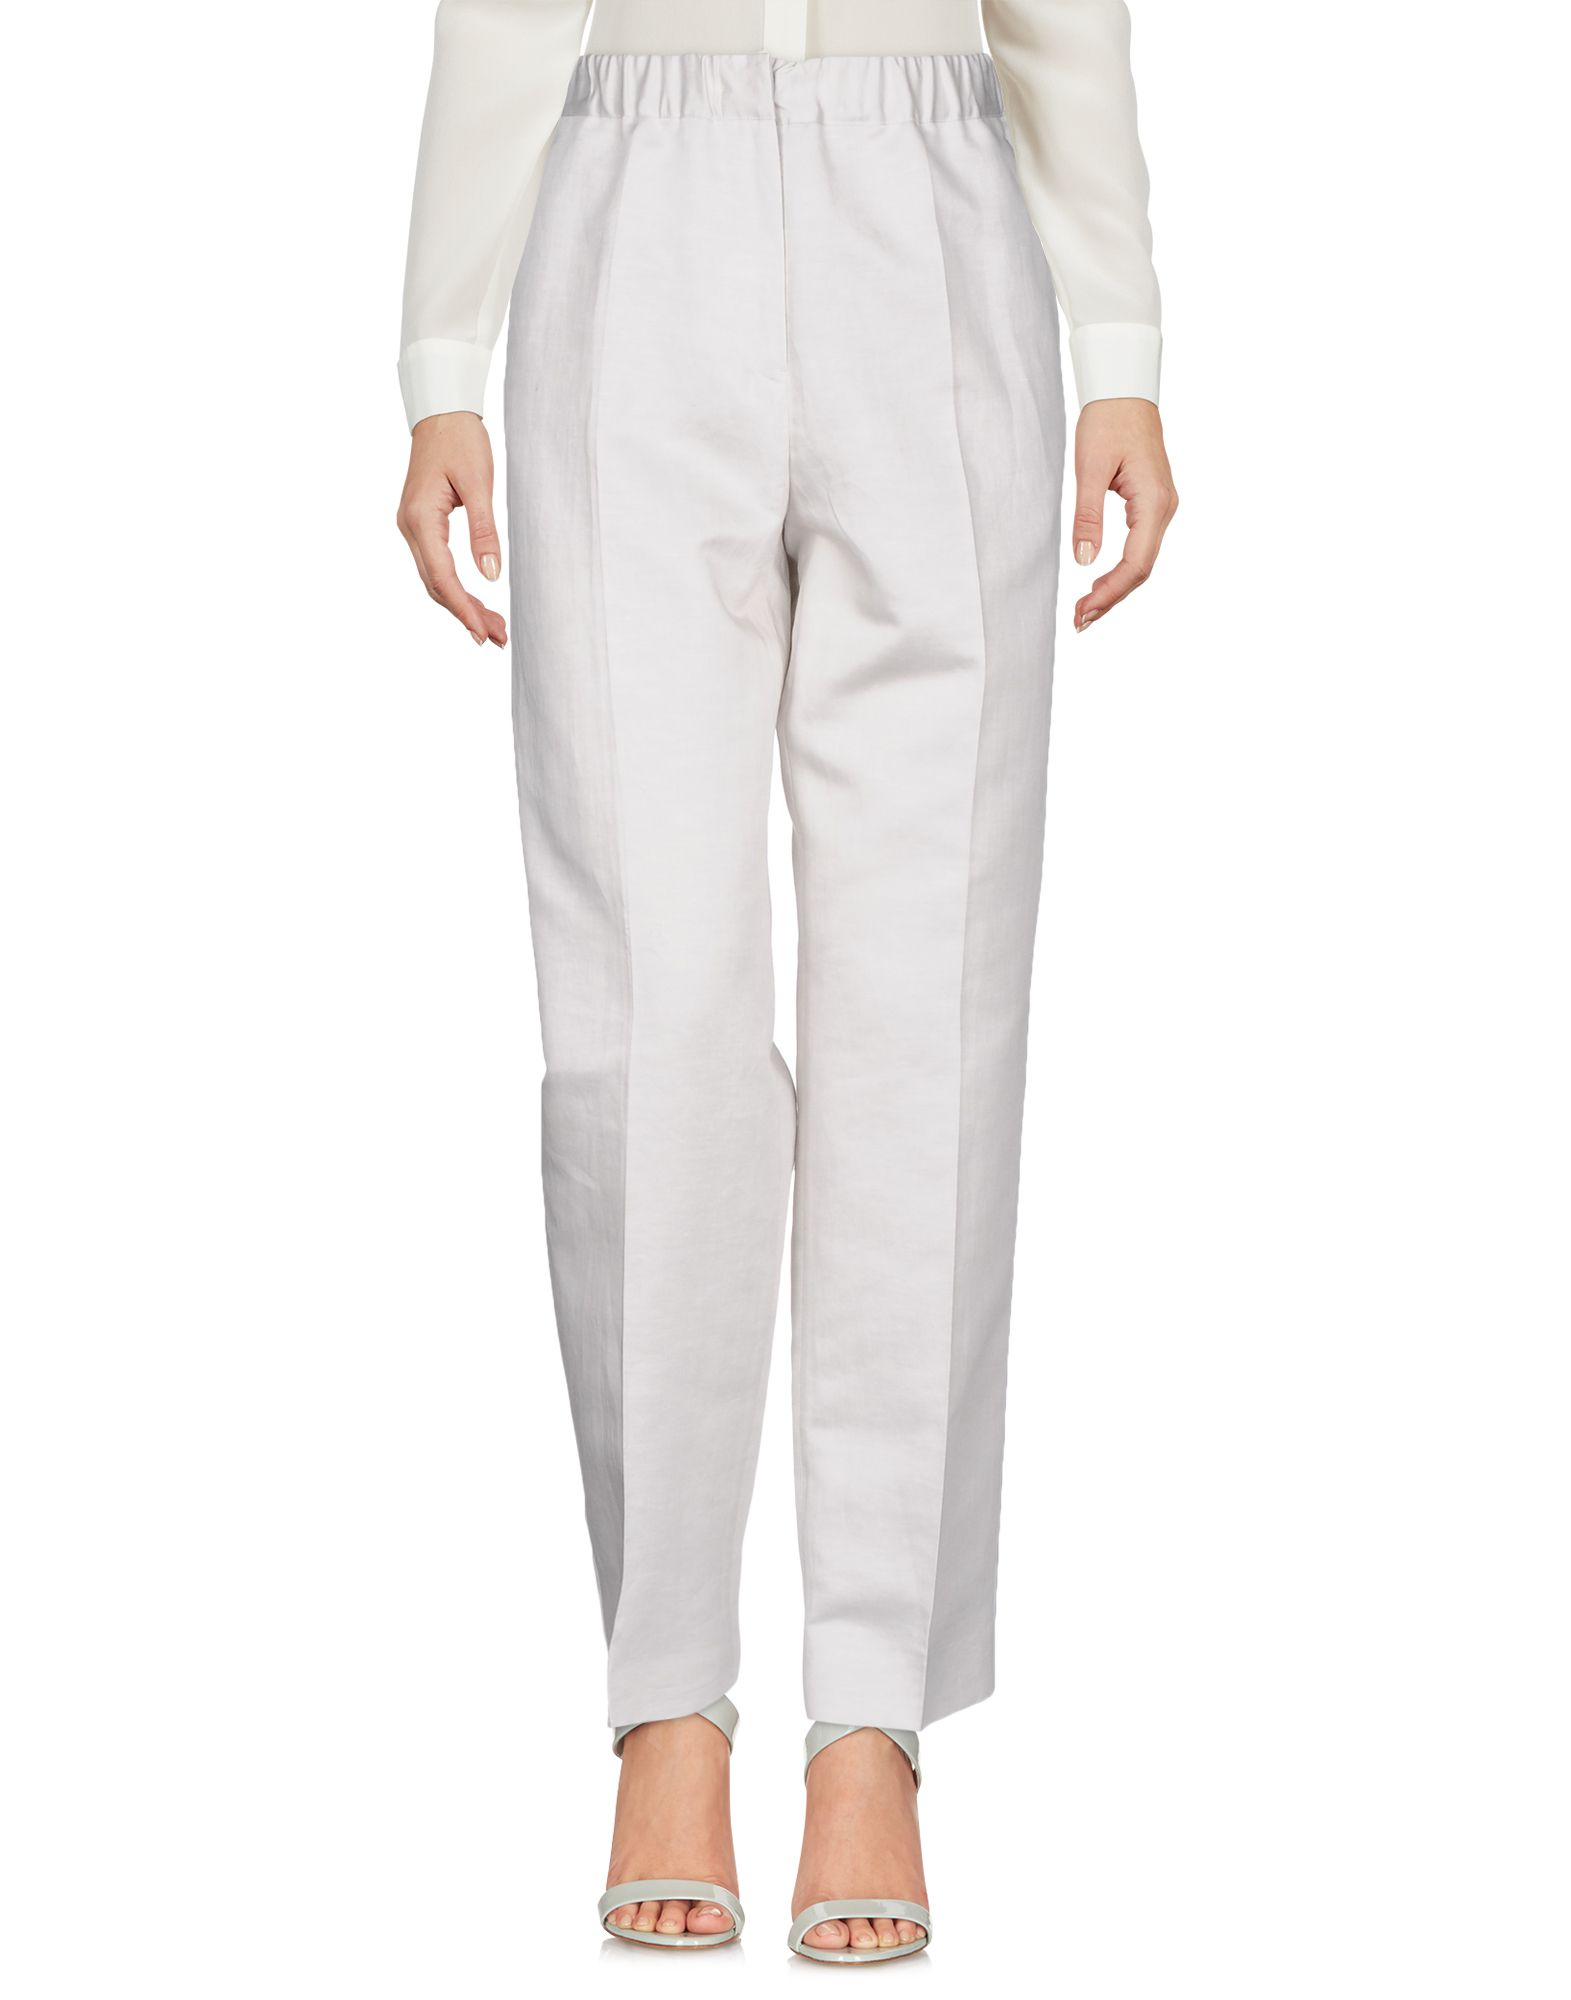 Pantalone Jil Sander Donna - Acquista online su z7qW7Gu